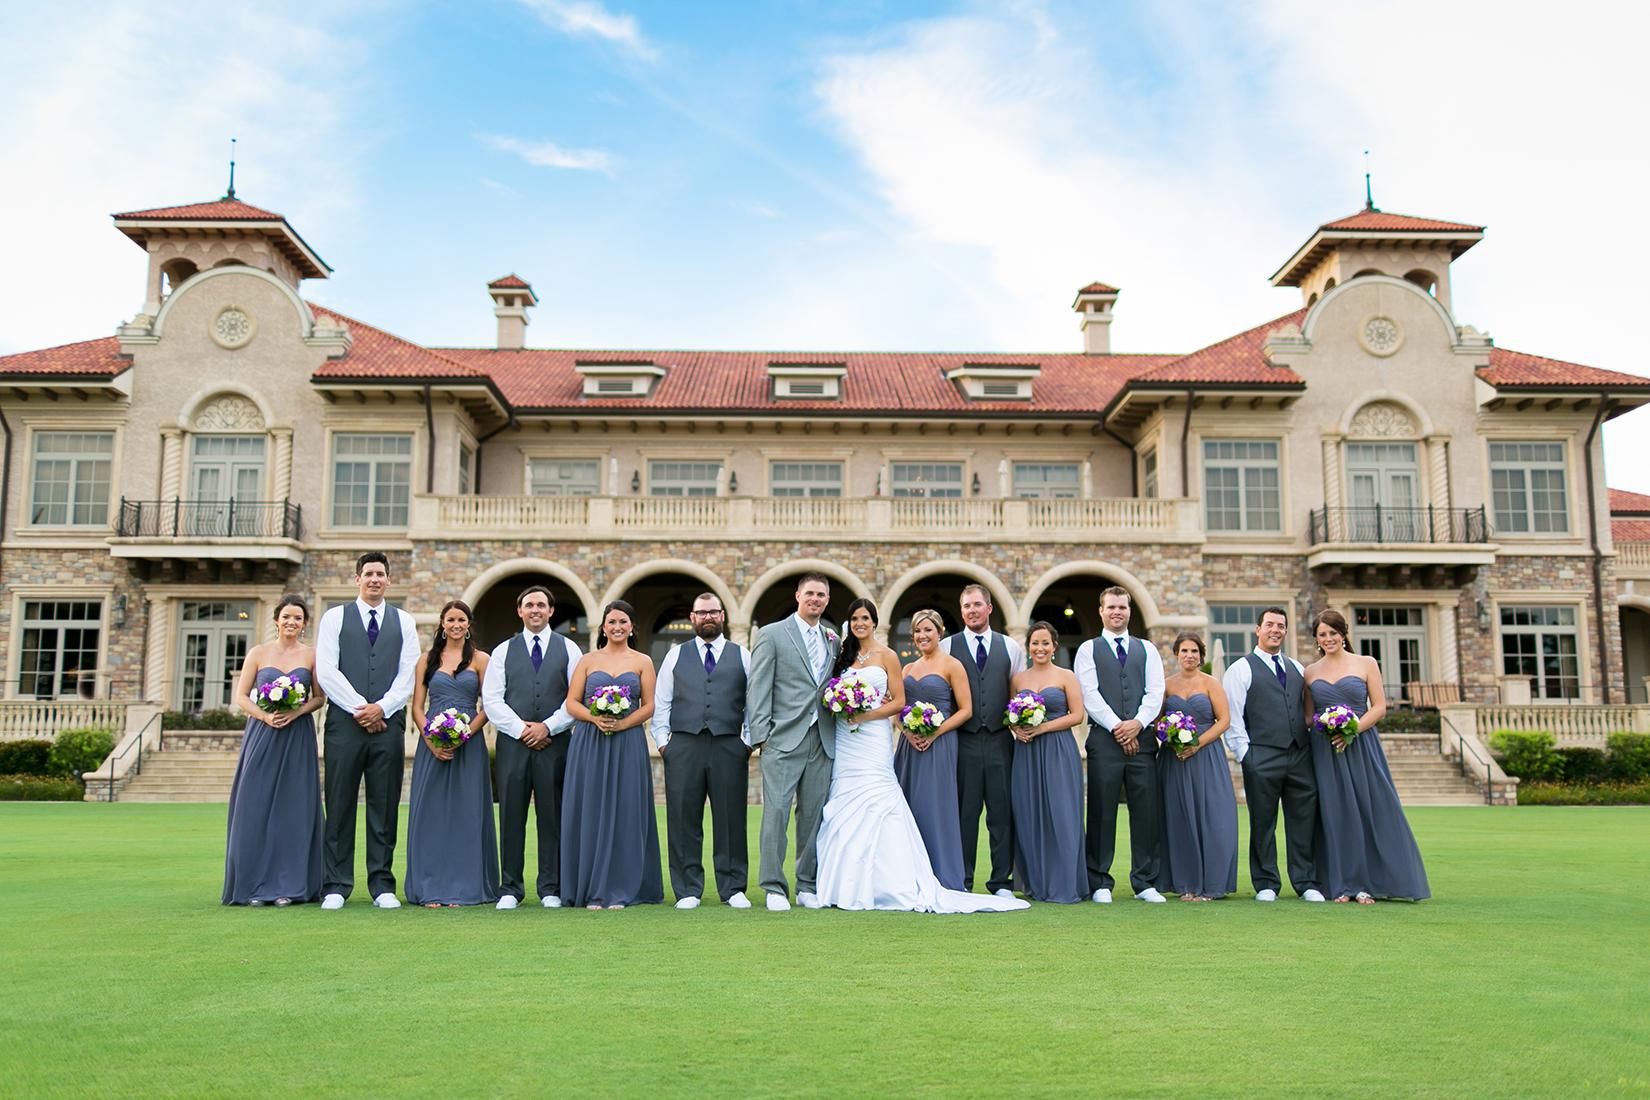 adam-szarmack-tpc-sawgrass-ponte-vedra-wedding-photographer-PZ3A9677.jpg